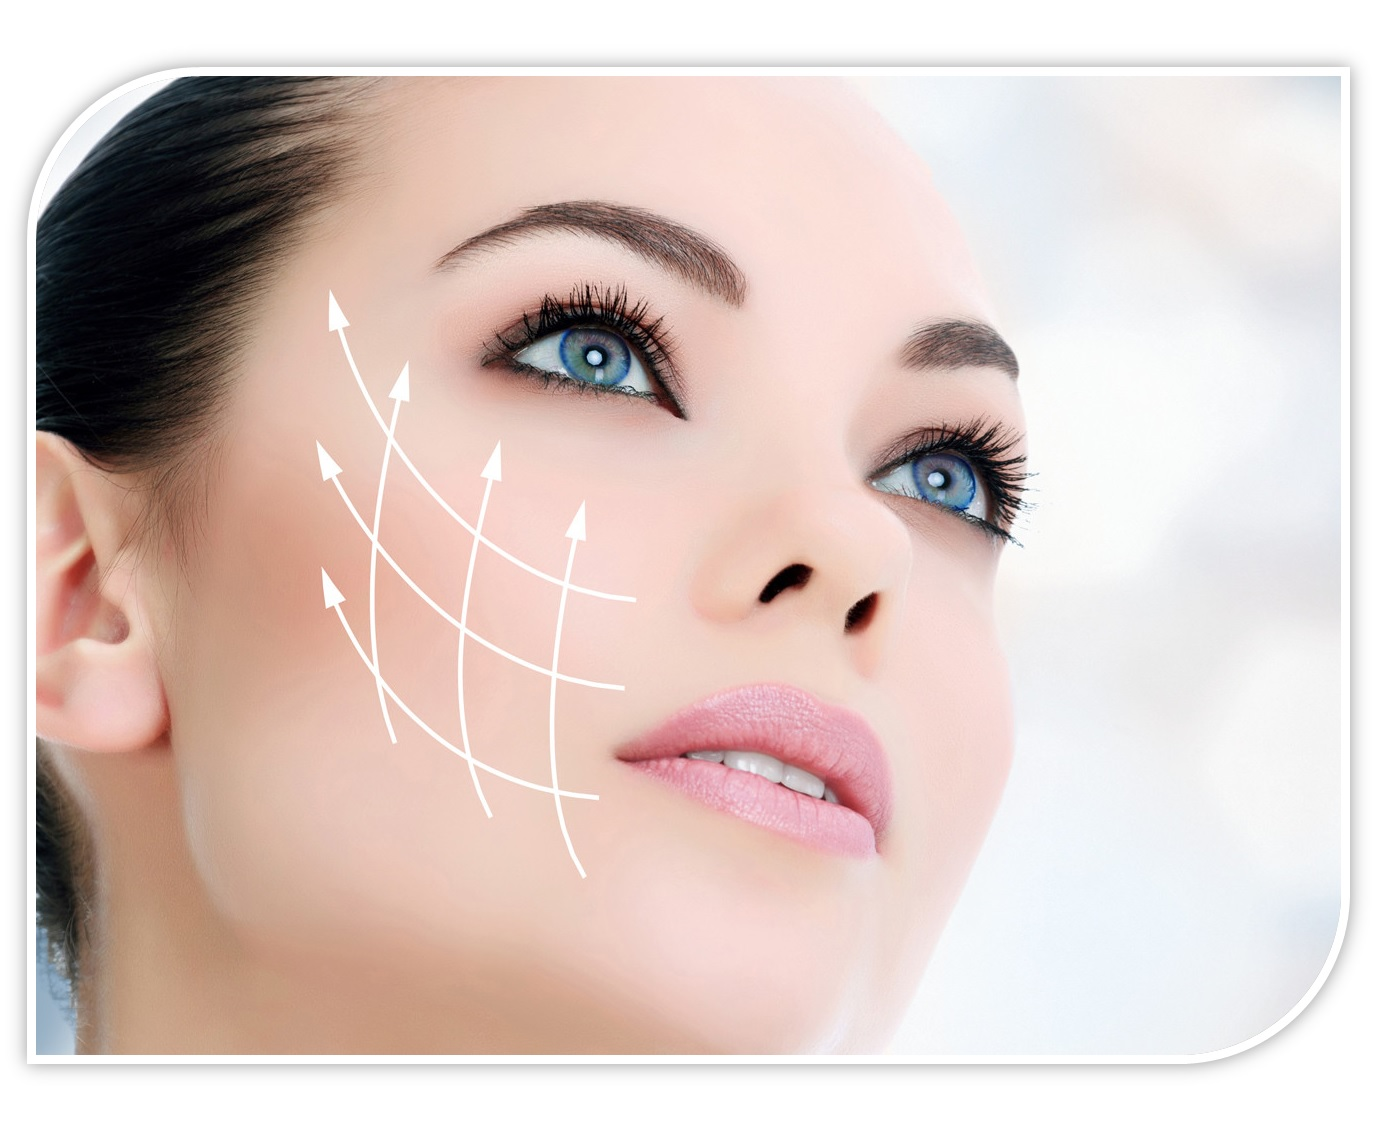 Crema + serum cell mater dermik revitalizante piel rostro y cuello